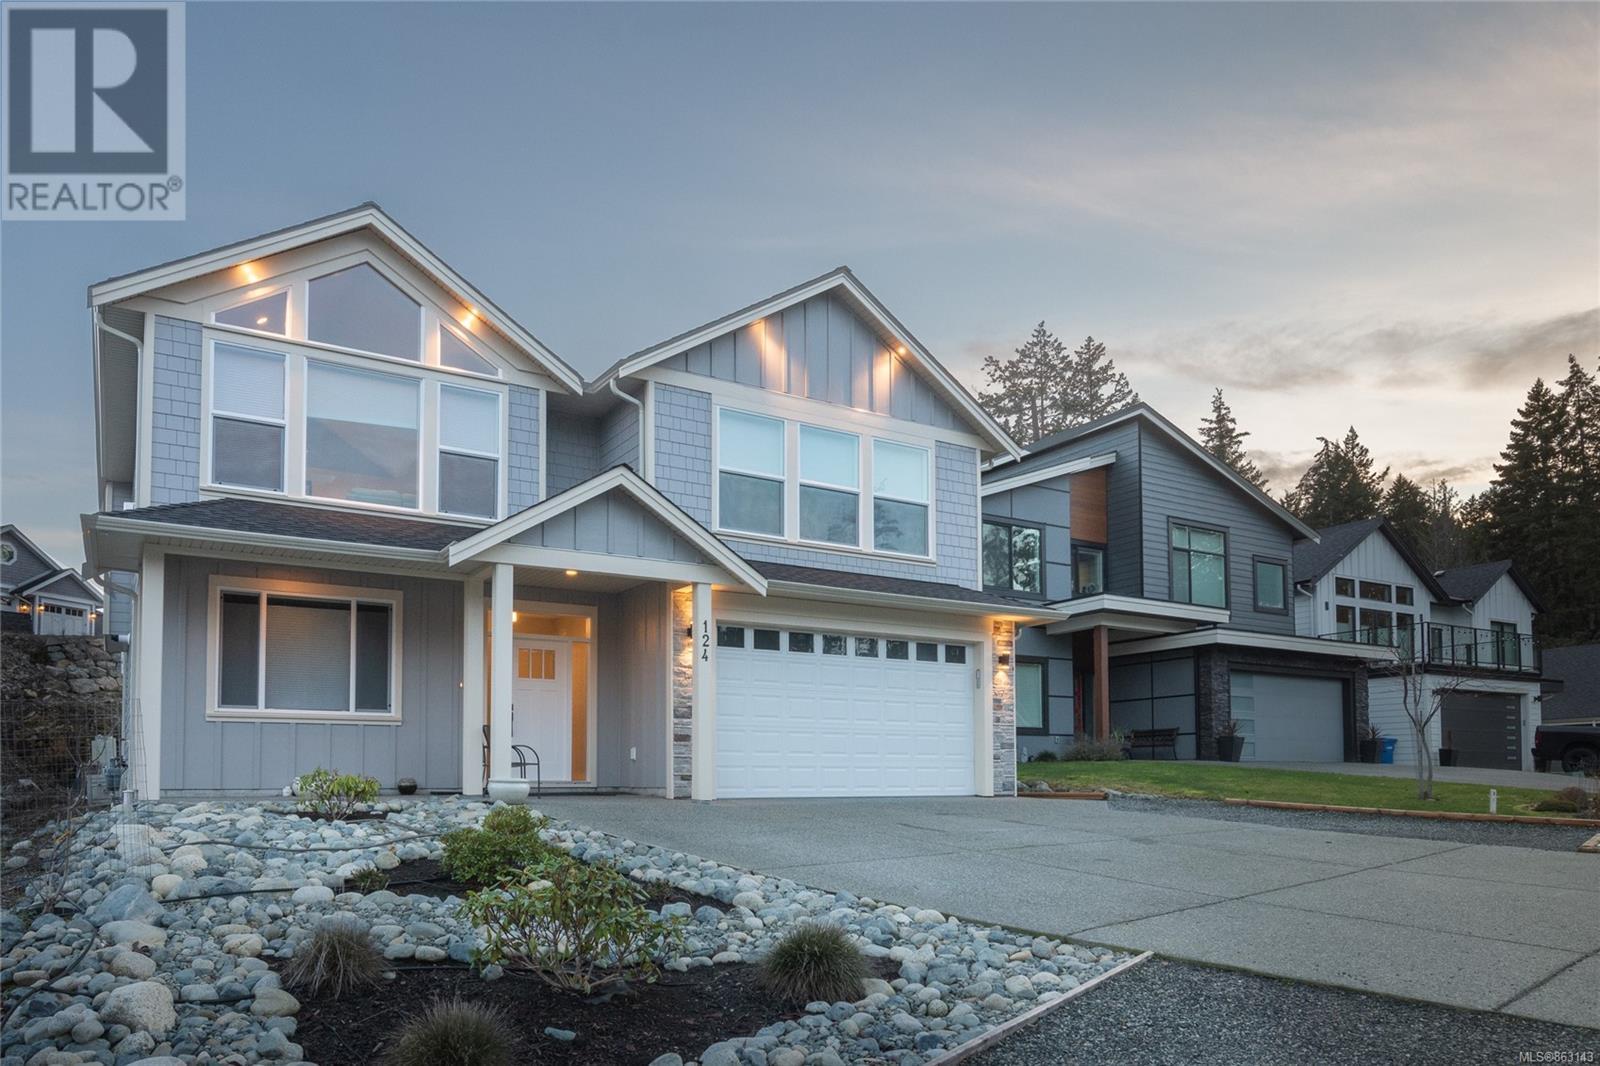 124 Bray Rd, Nanaimo, British Columbia  V9T 0J8 - Photo 2 - 863143